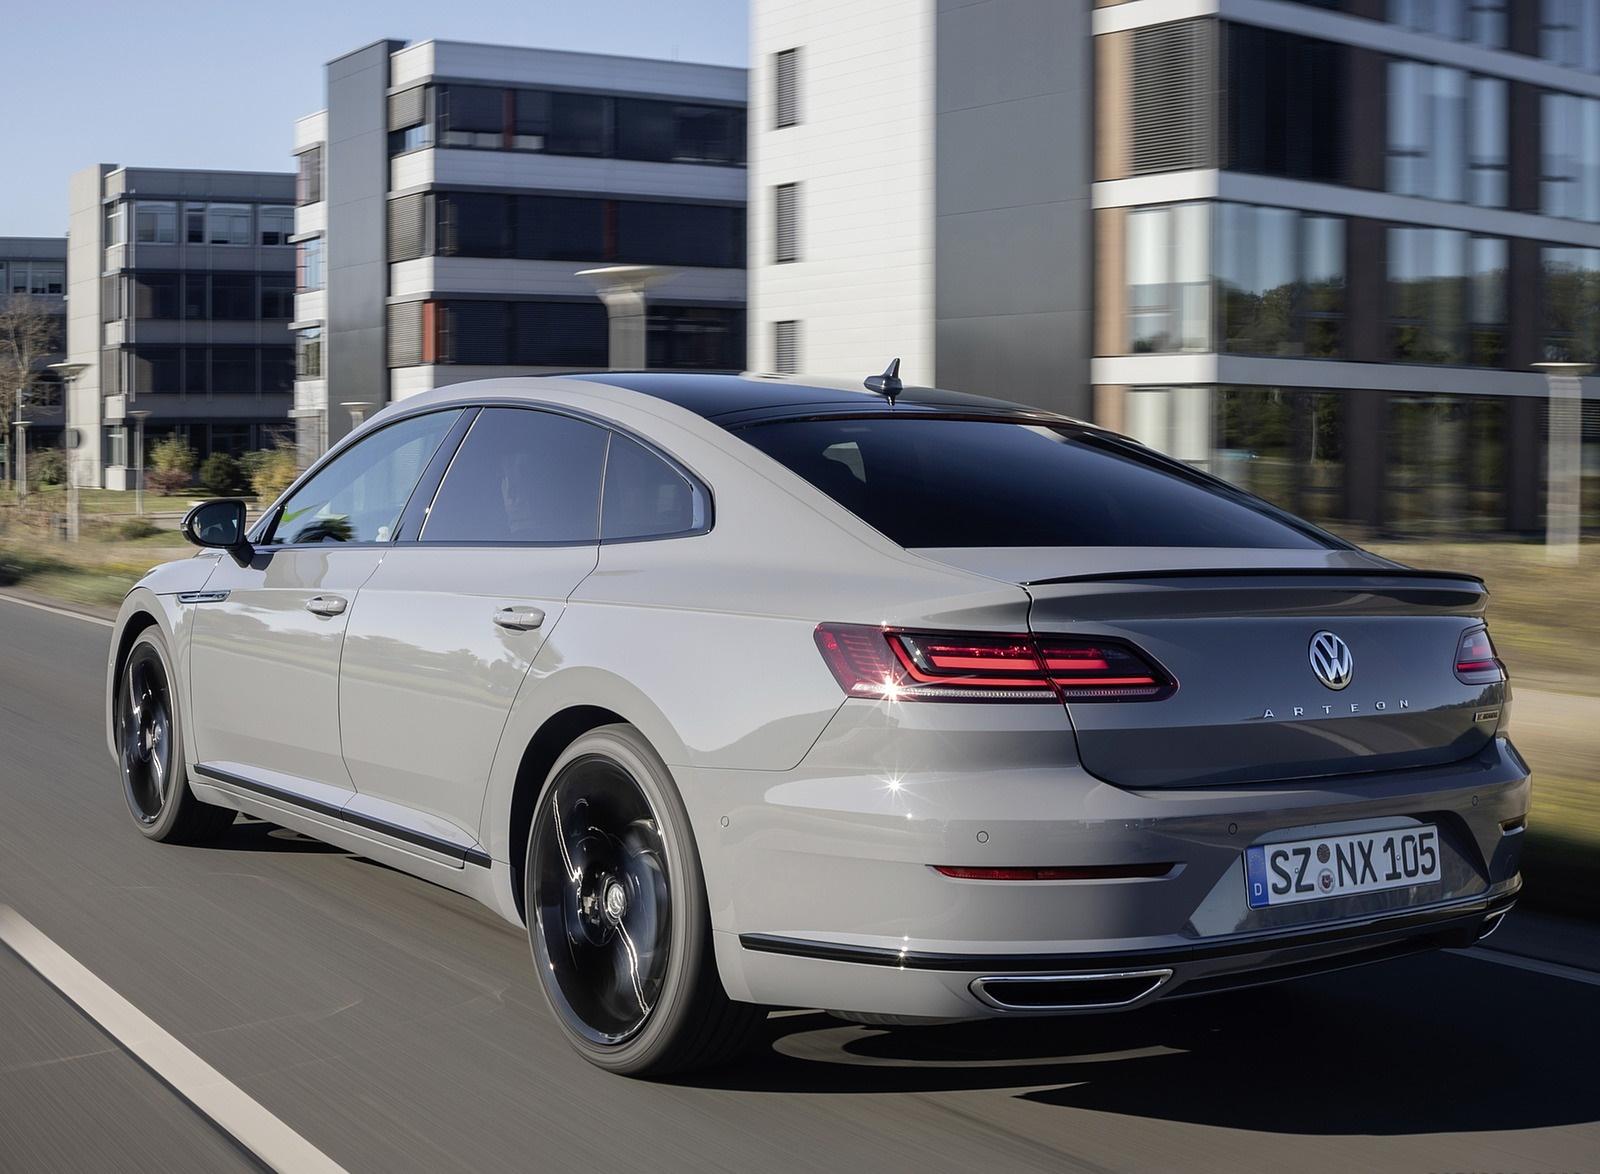 2020 Volkswagen Arteon R-Line Edition Rear Three-Quarter Wallpapers (8)